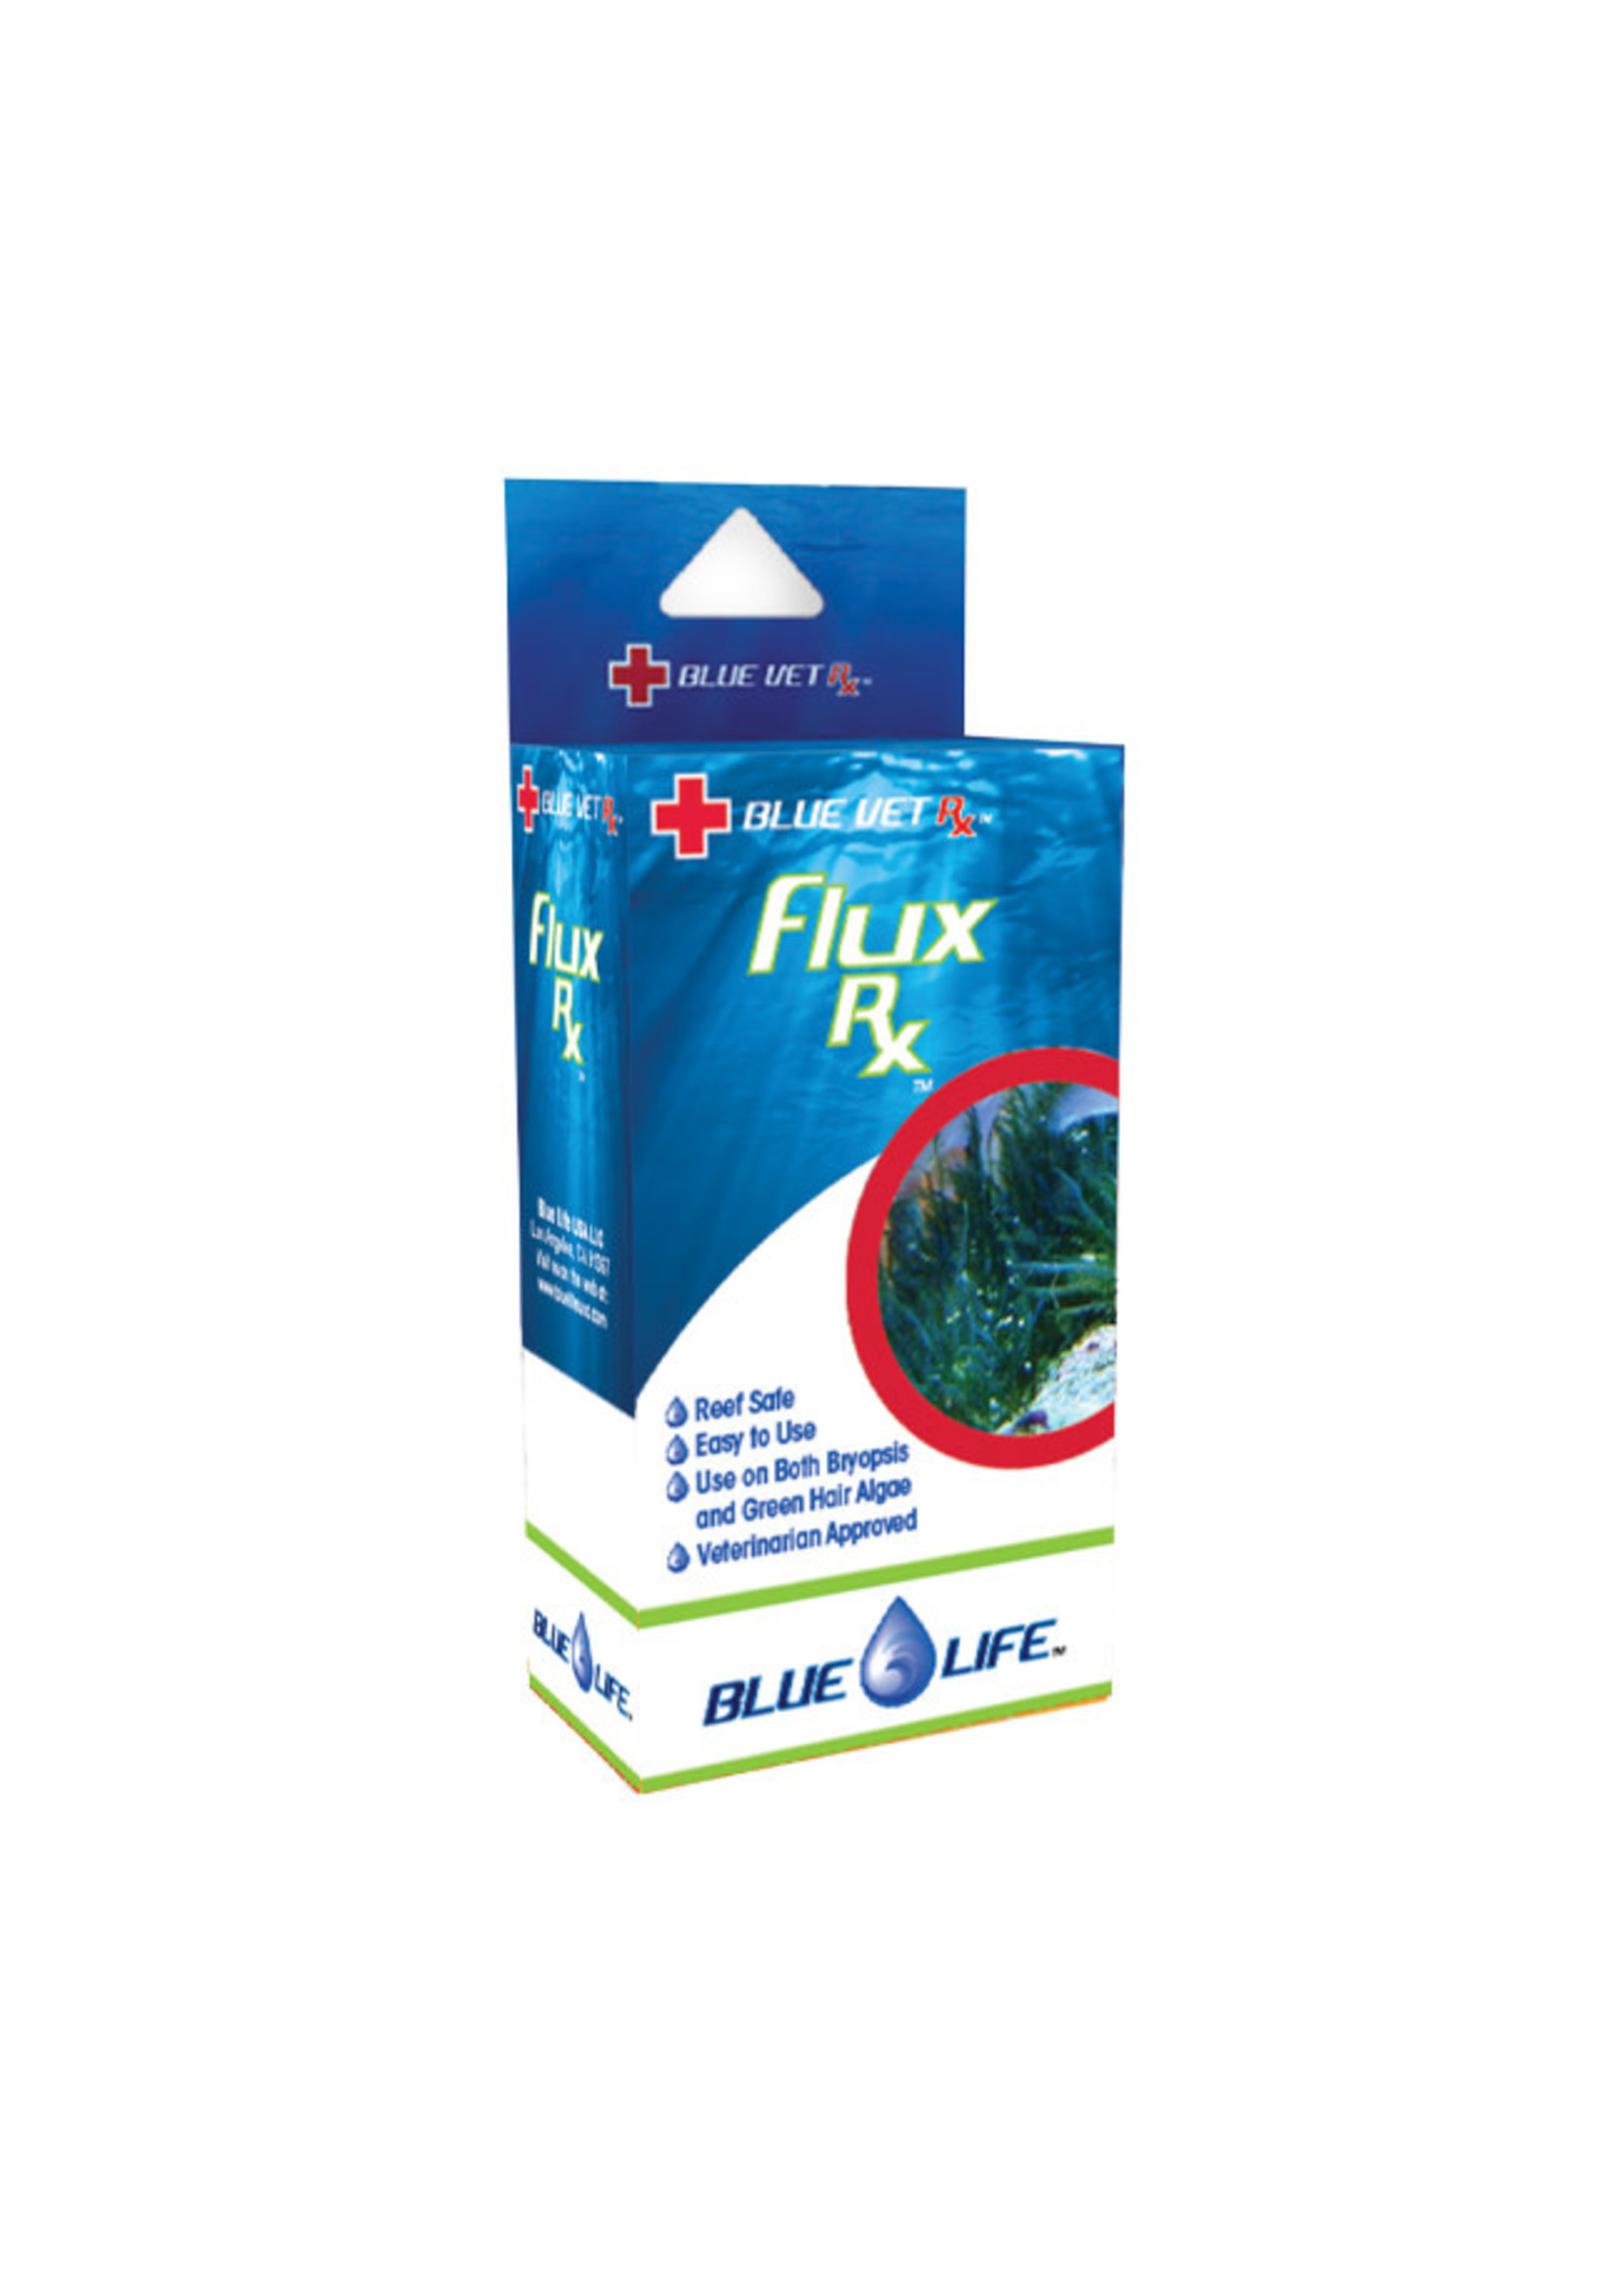 Blue Life Blue Life Flux Rx